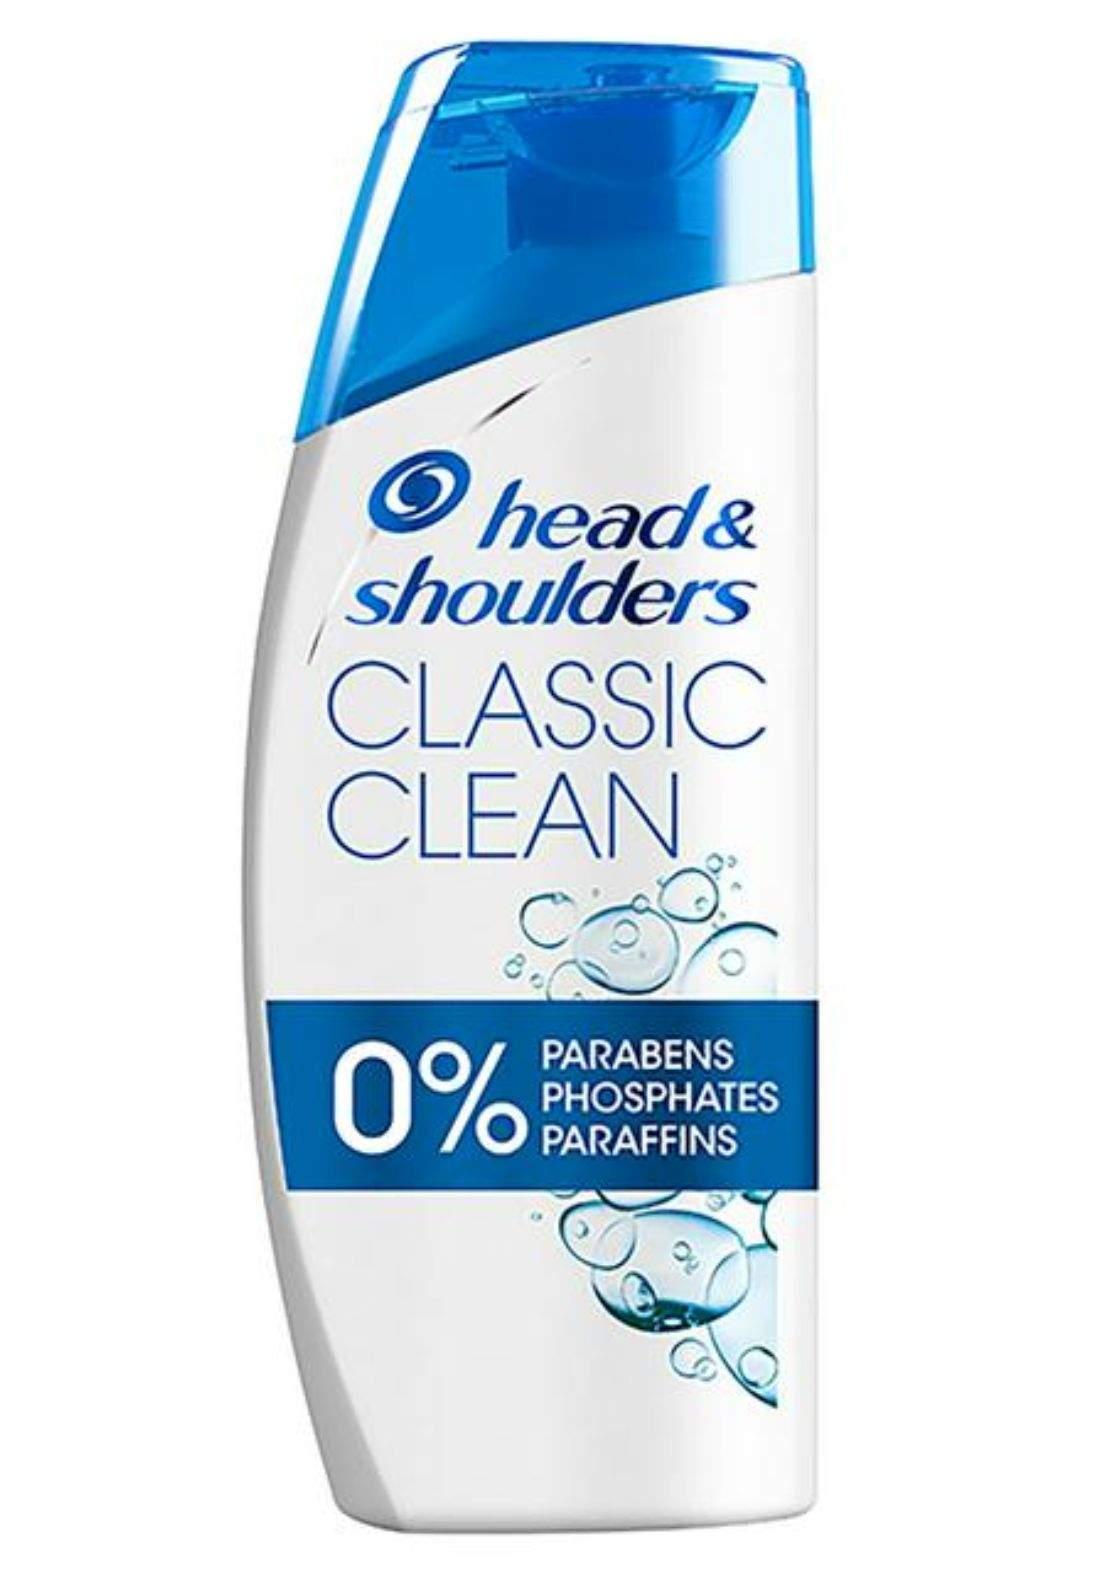 Head & shoulders shampoo 400 ml شامبو هيد ان دشولدرز